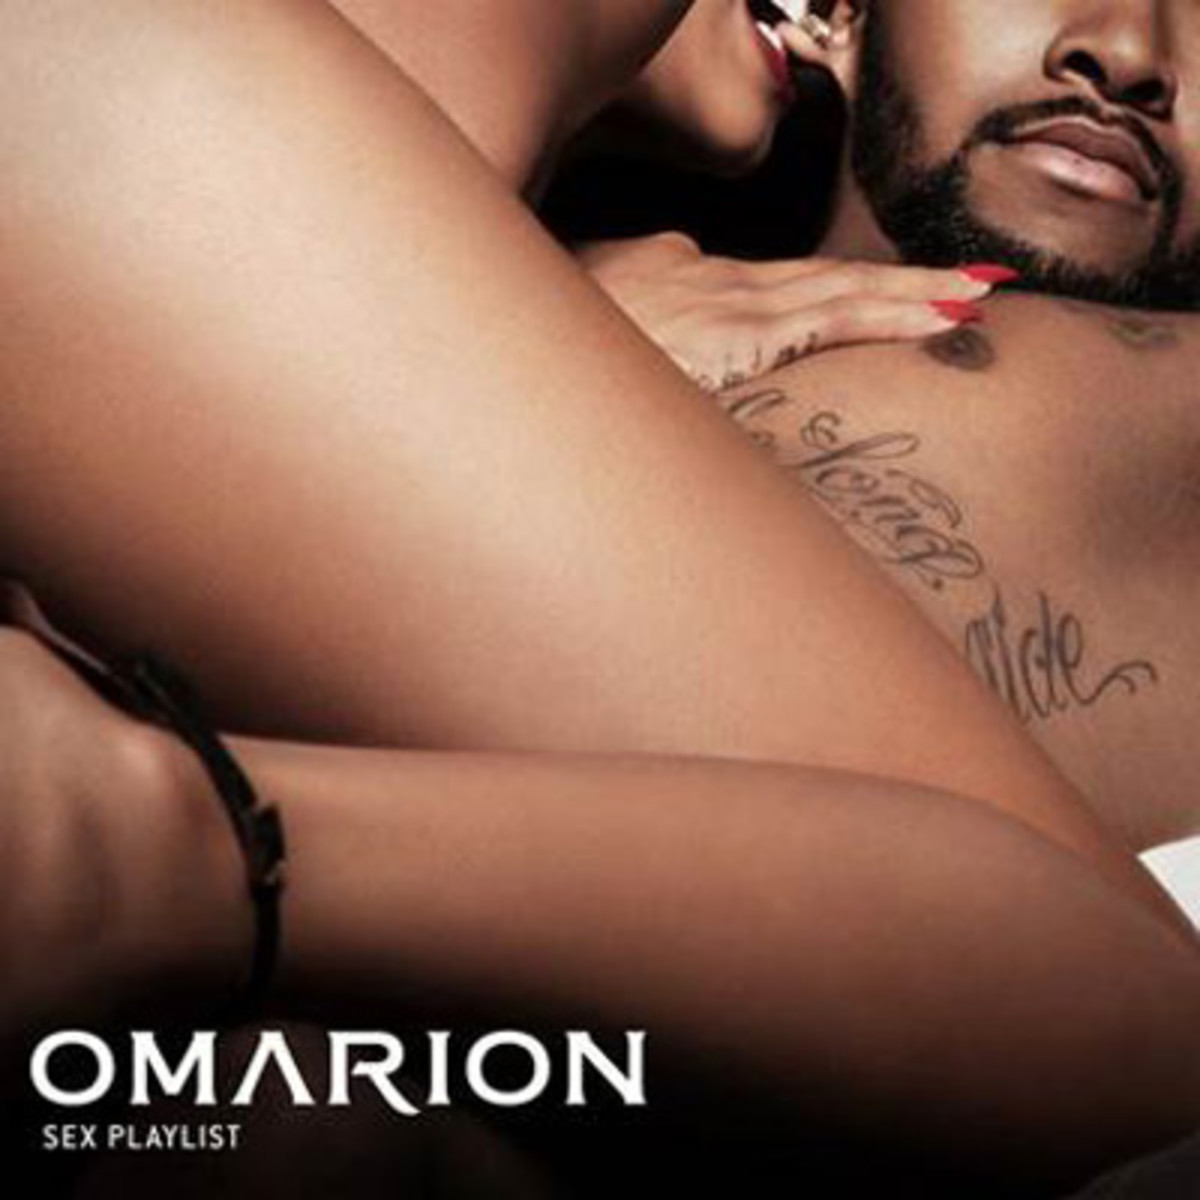 omarion-sexplaylist.jpg